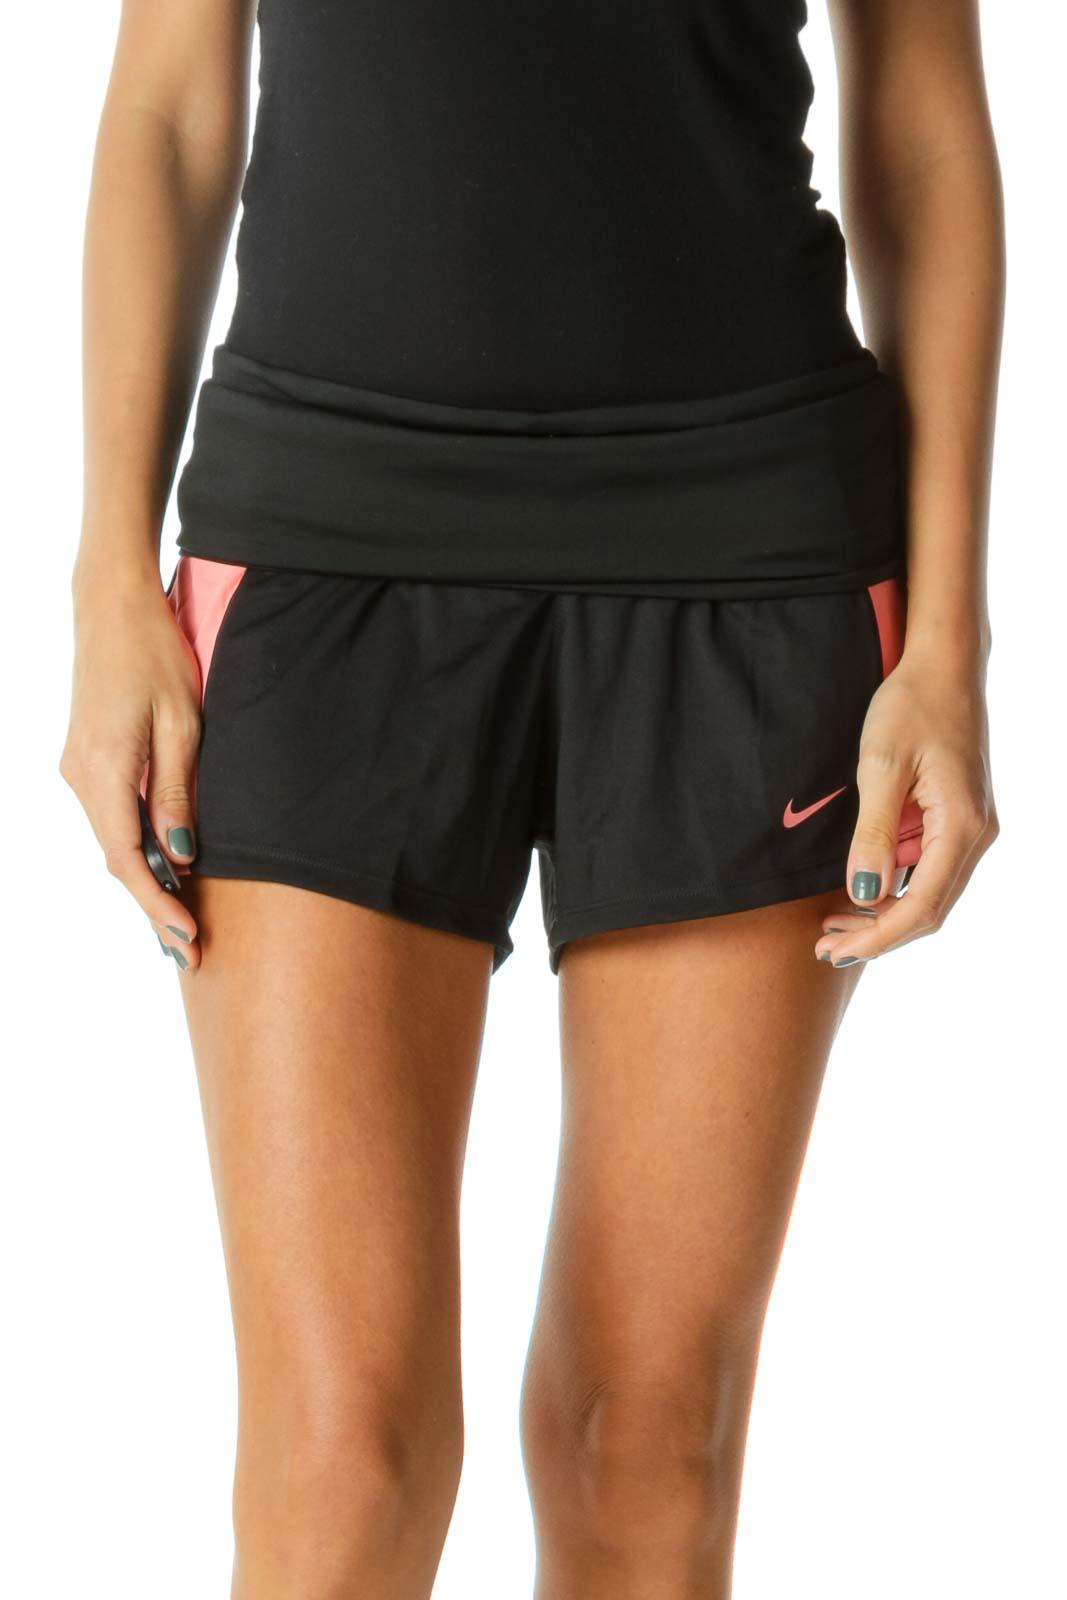 Black Pink Inside Drawstring Stretch Sports Shorts